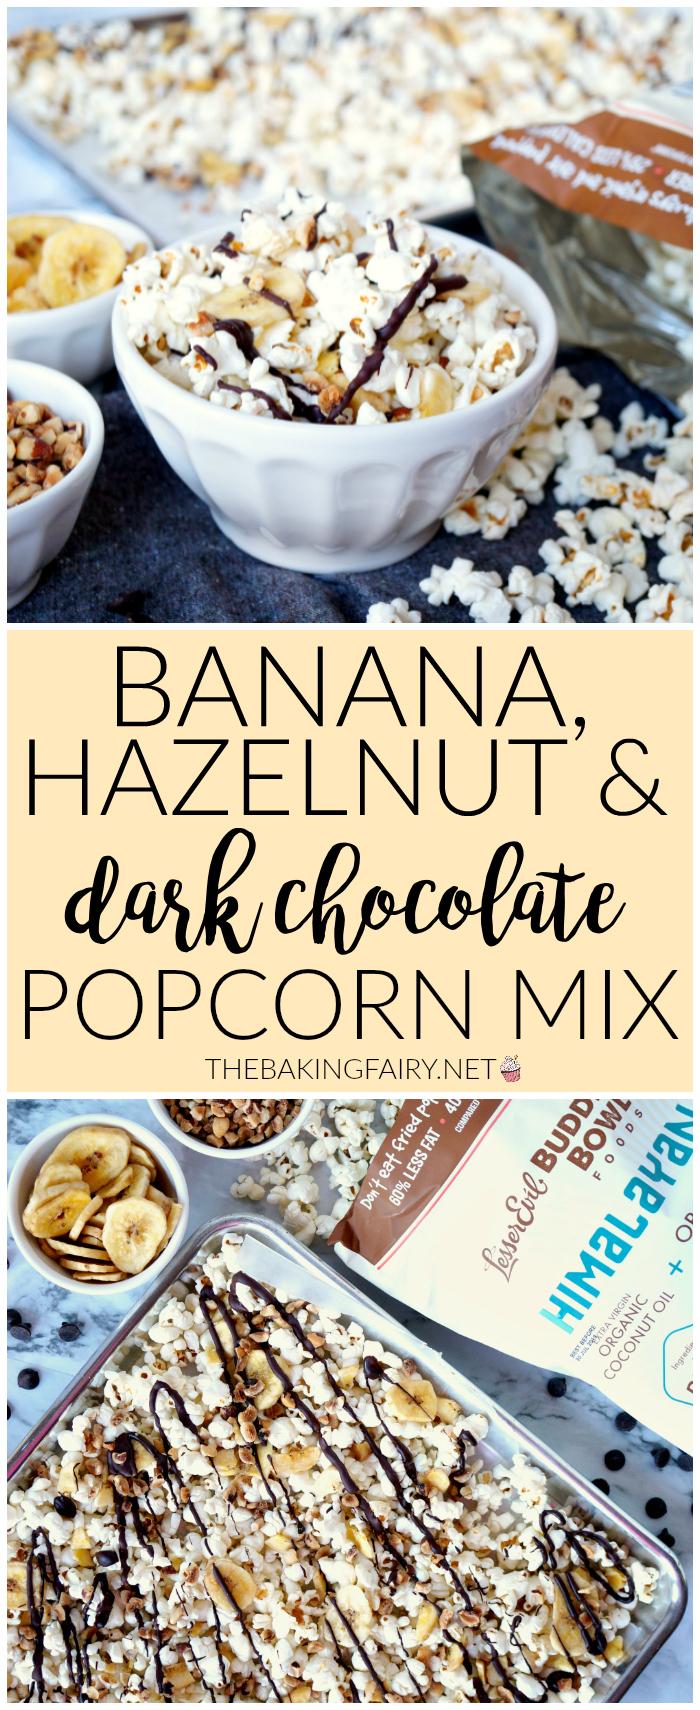 banana, hazelnut, and dark chocolate popcorn snack mix | The Baking Fairy #NewYearLessEvil #ad